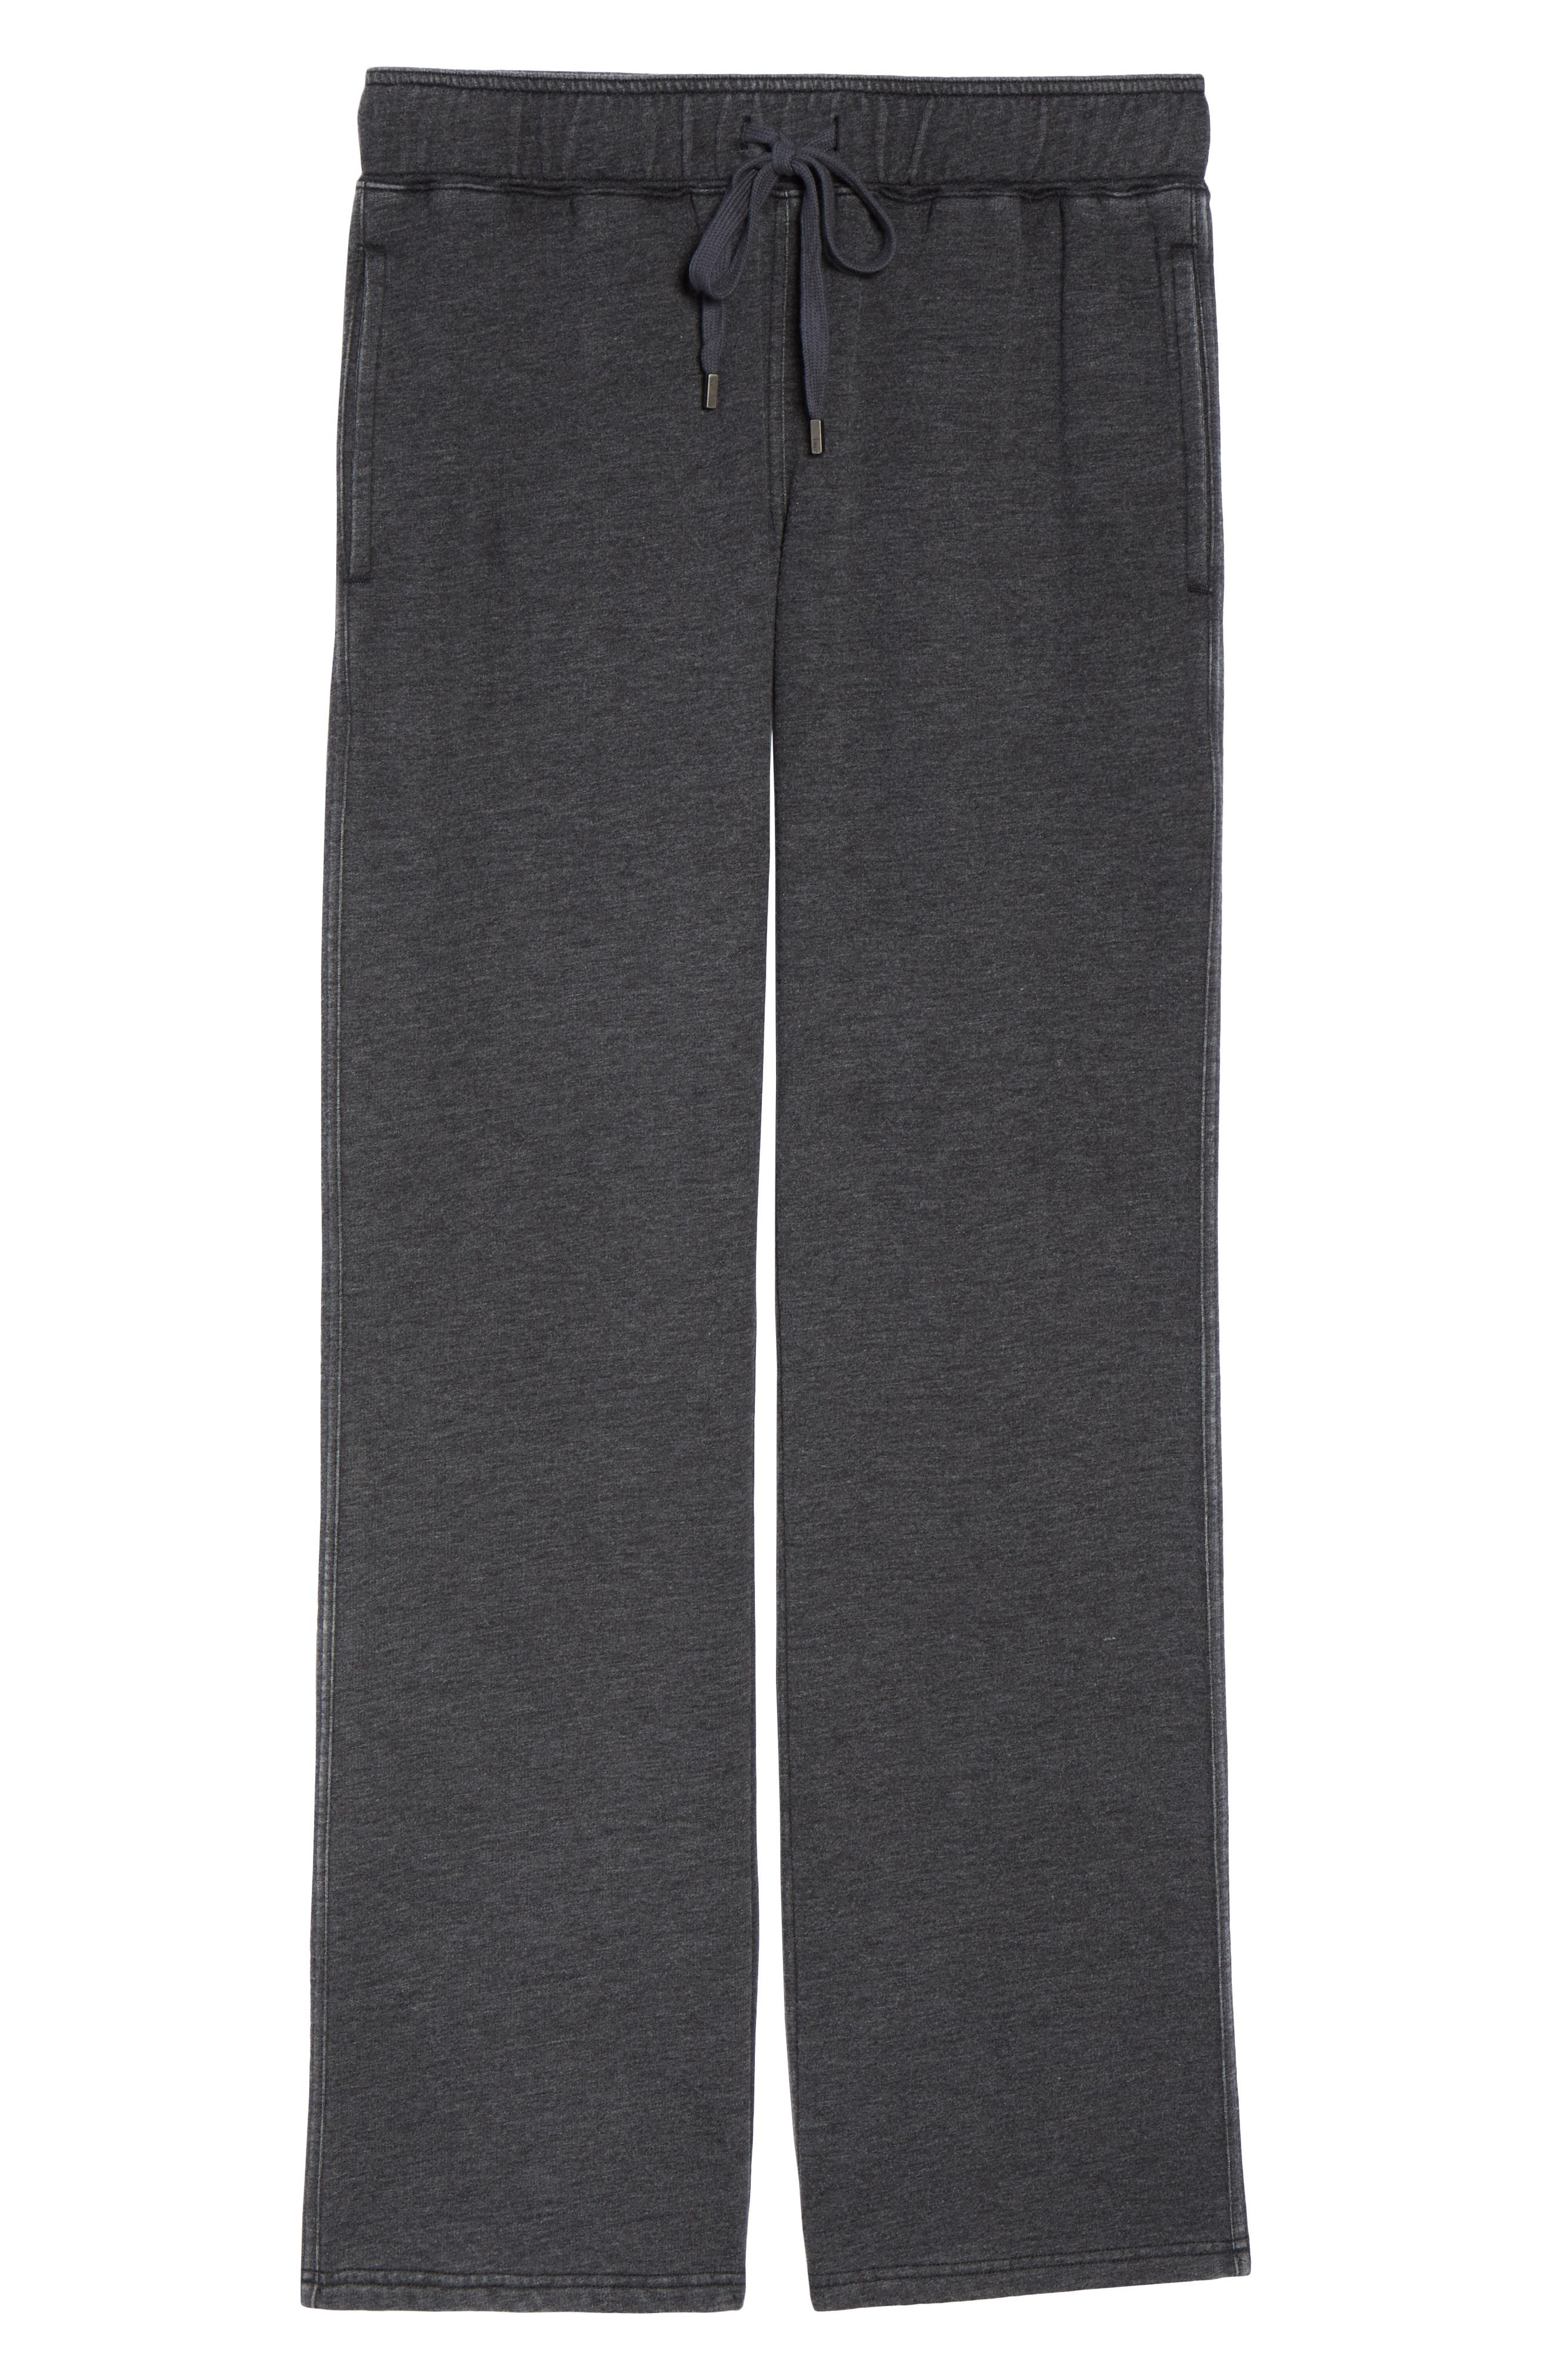 Cora Lounge Pants,                             Alternate thumbnail 6, color,                             020